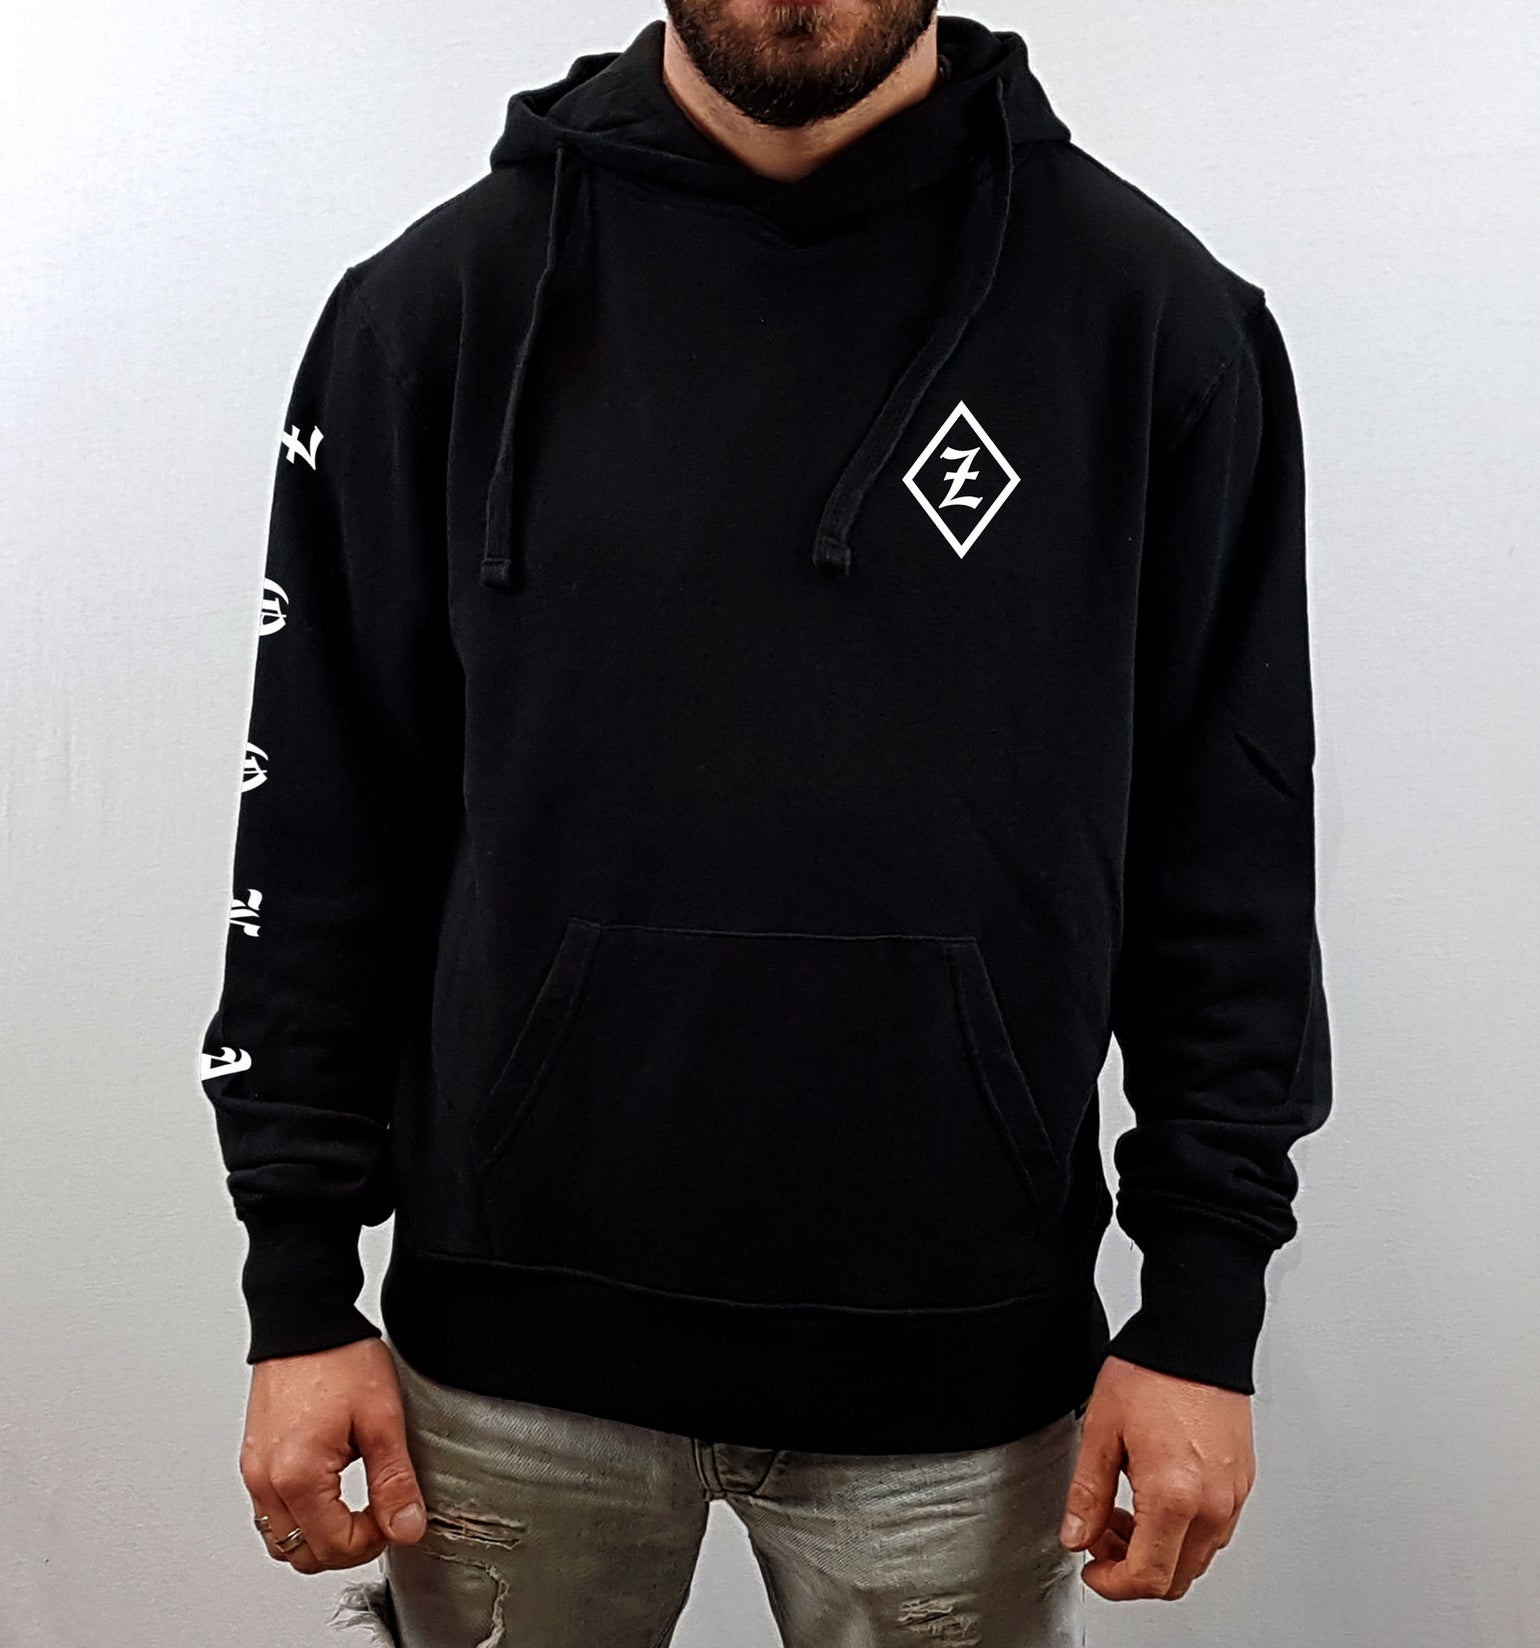 Image of armageddon black hood